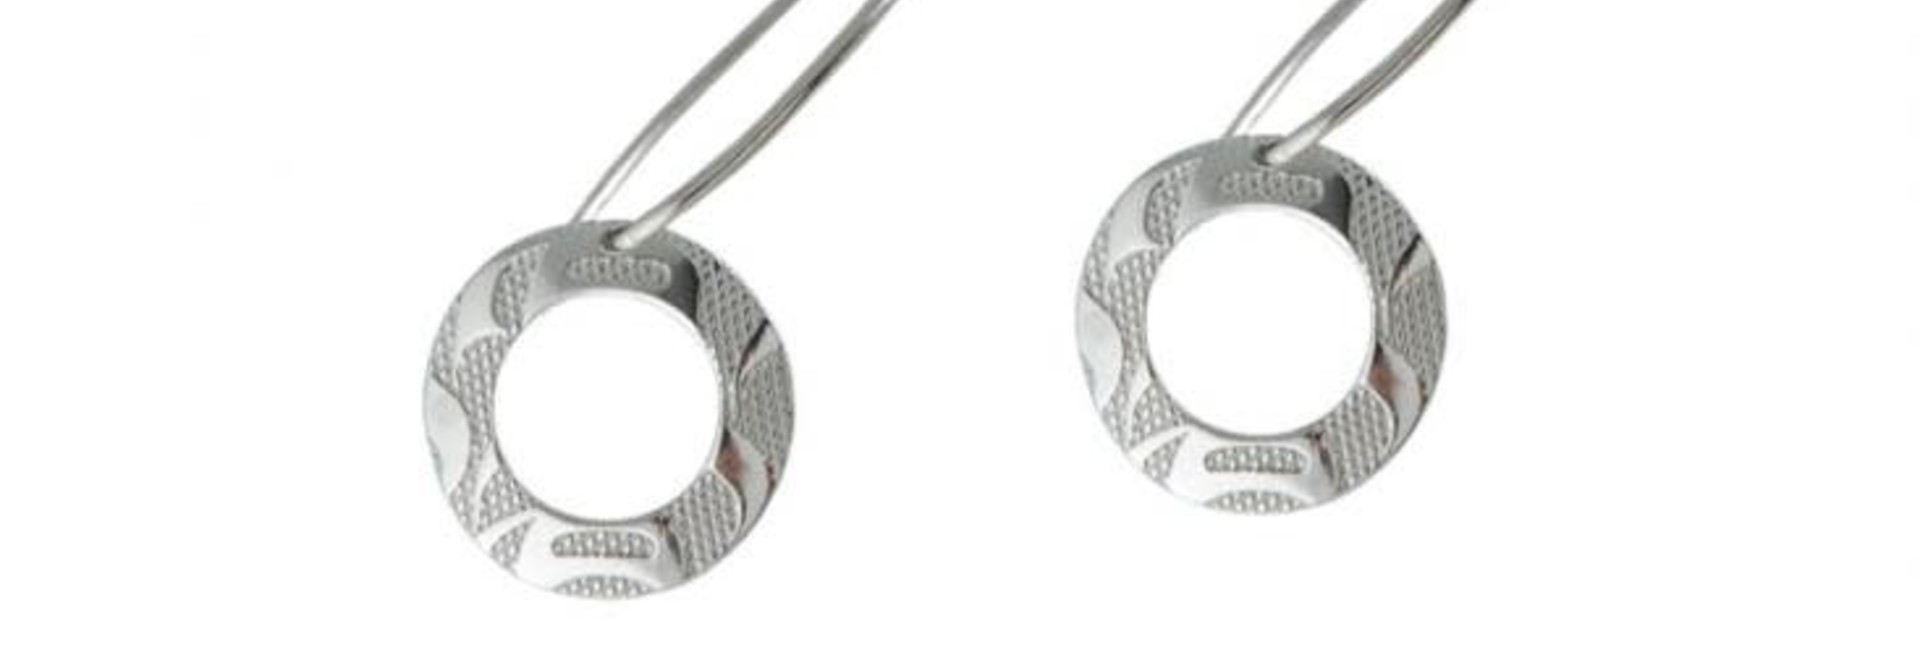 Silver Pewter Equilibrium Earrings Petite